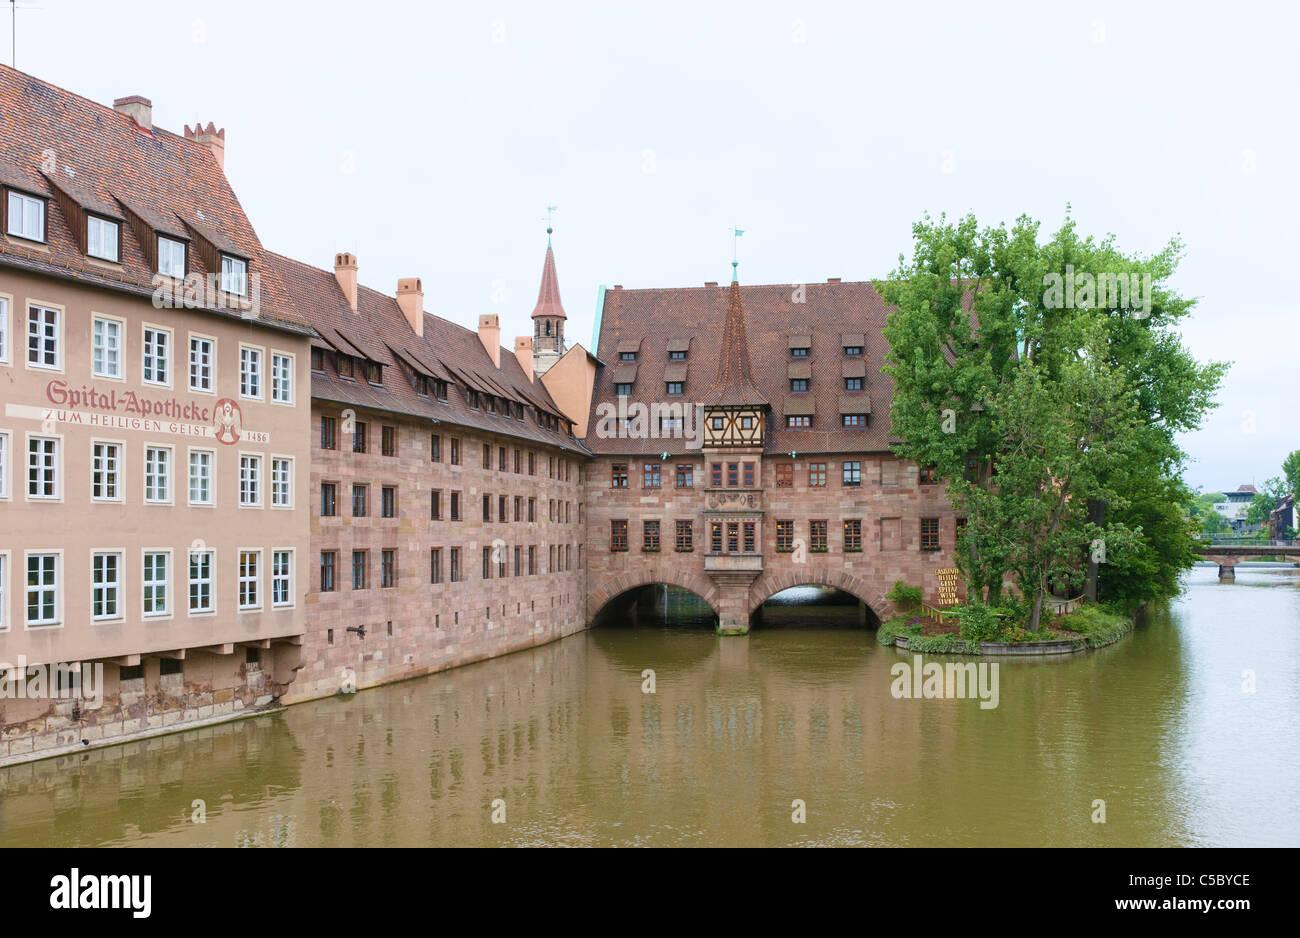 Nürnberg-Heilig-Geist-Spital (Krankenhaus des Heiligen Geistes) über Fluss Pegnitz Stockbild